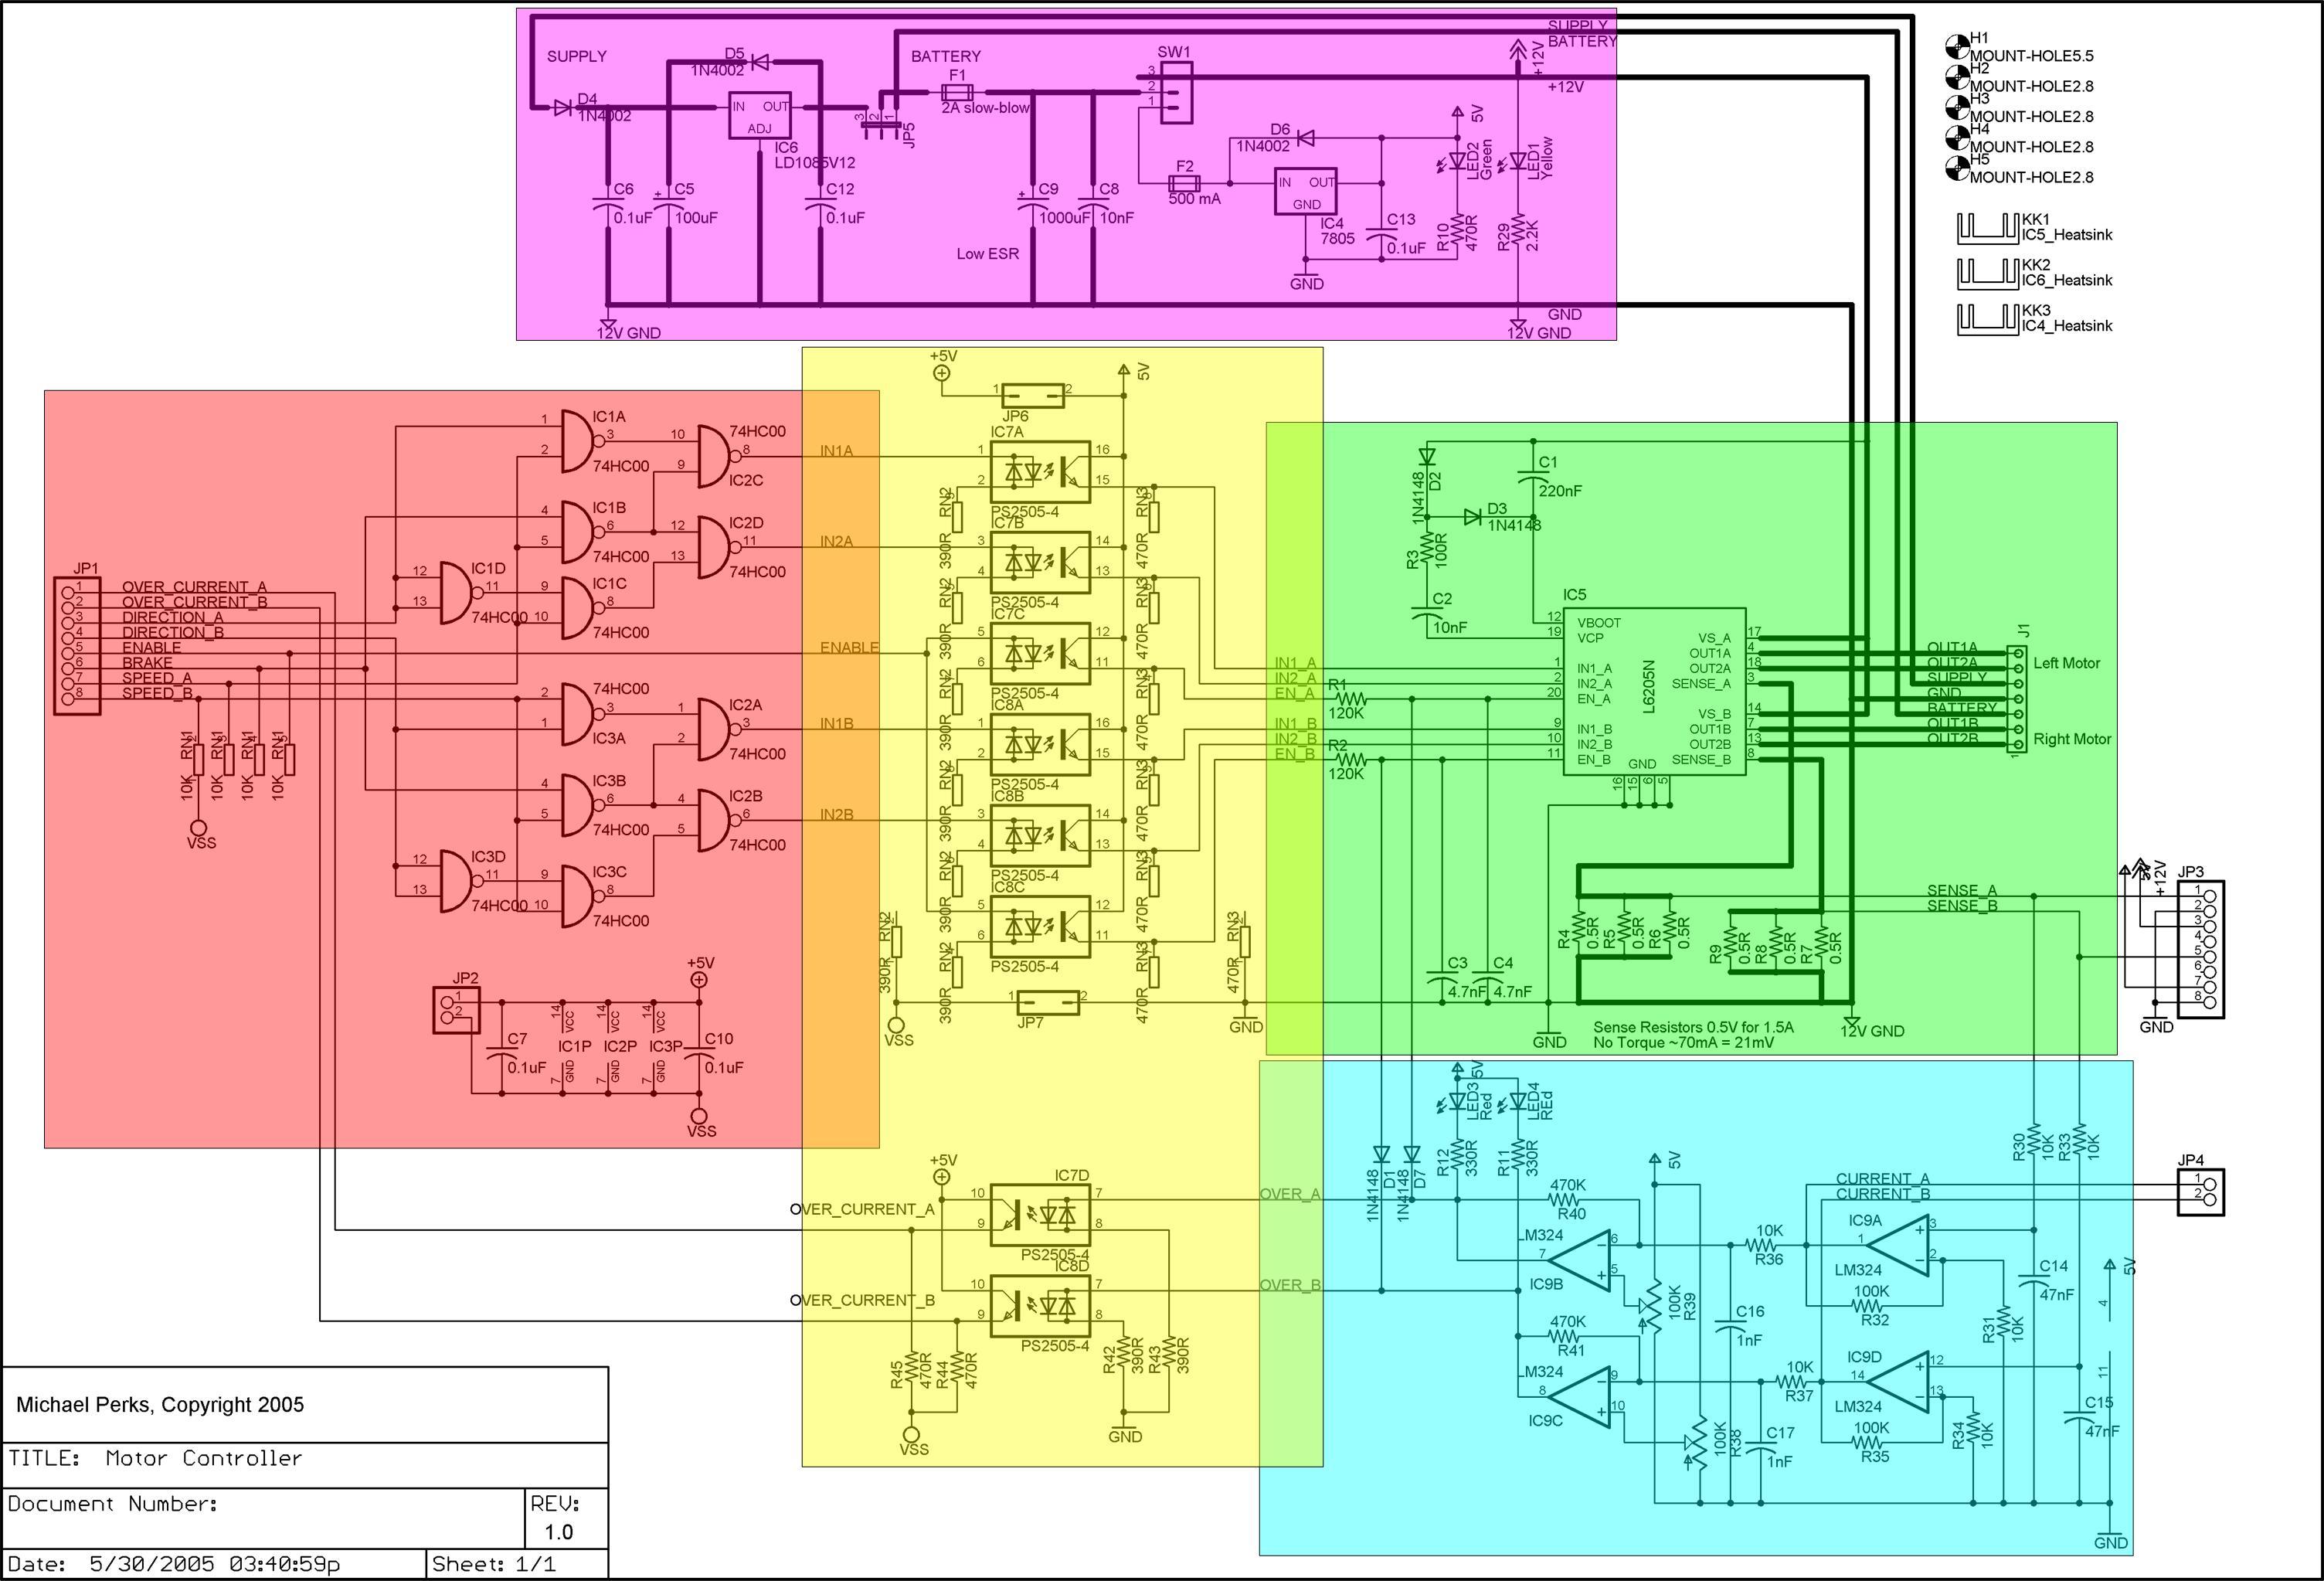 Kk2 Wiring Diagram Kk Board